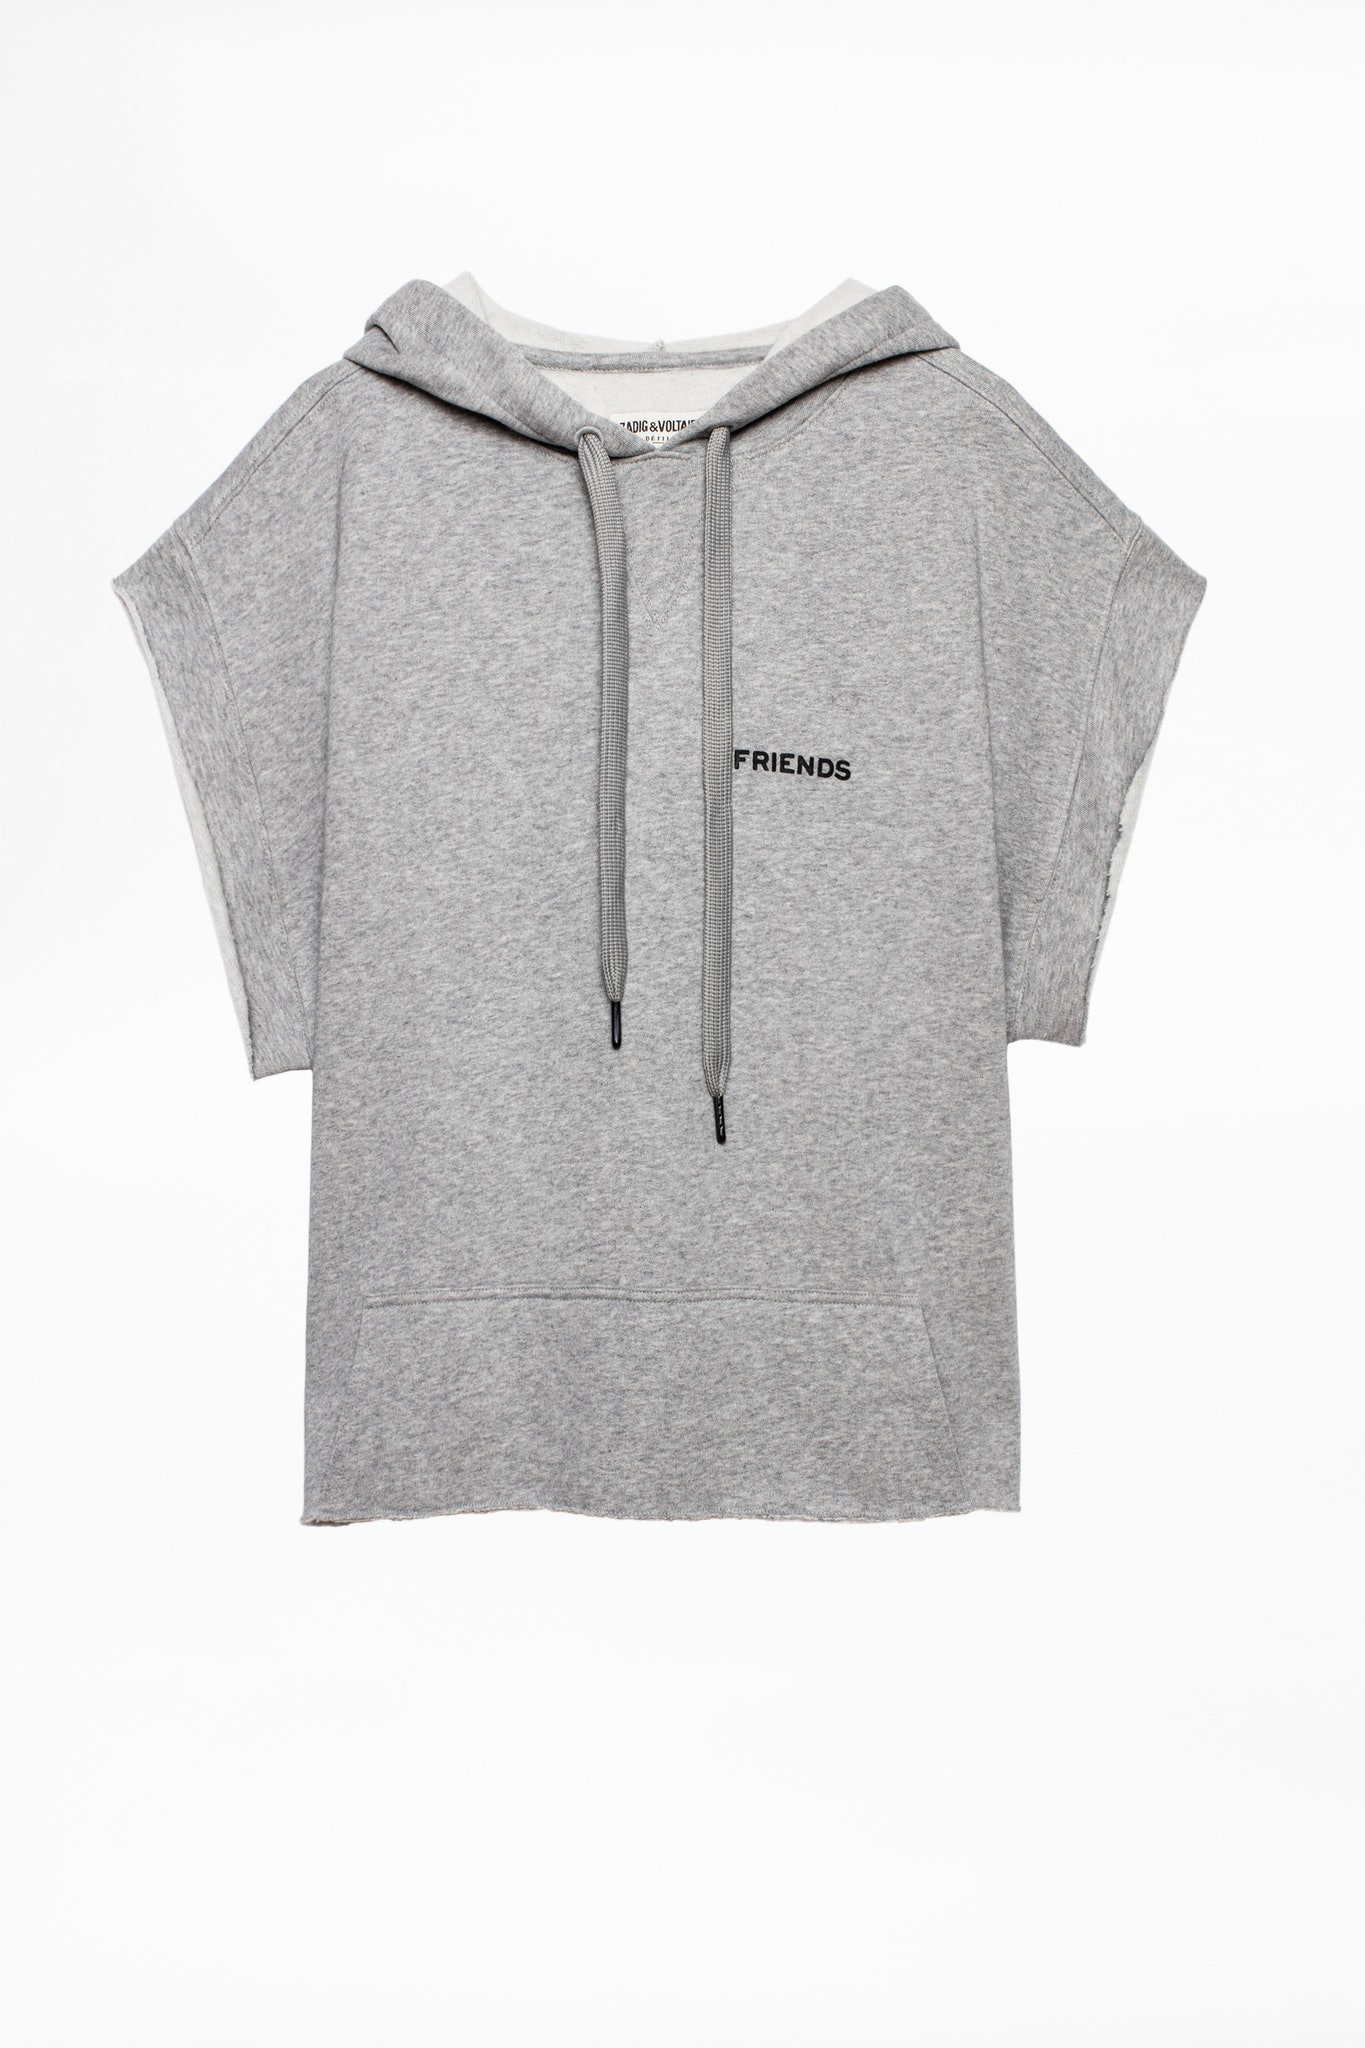 D-Beals Friends Sweatshirt